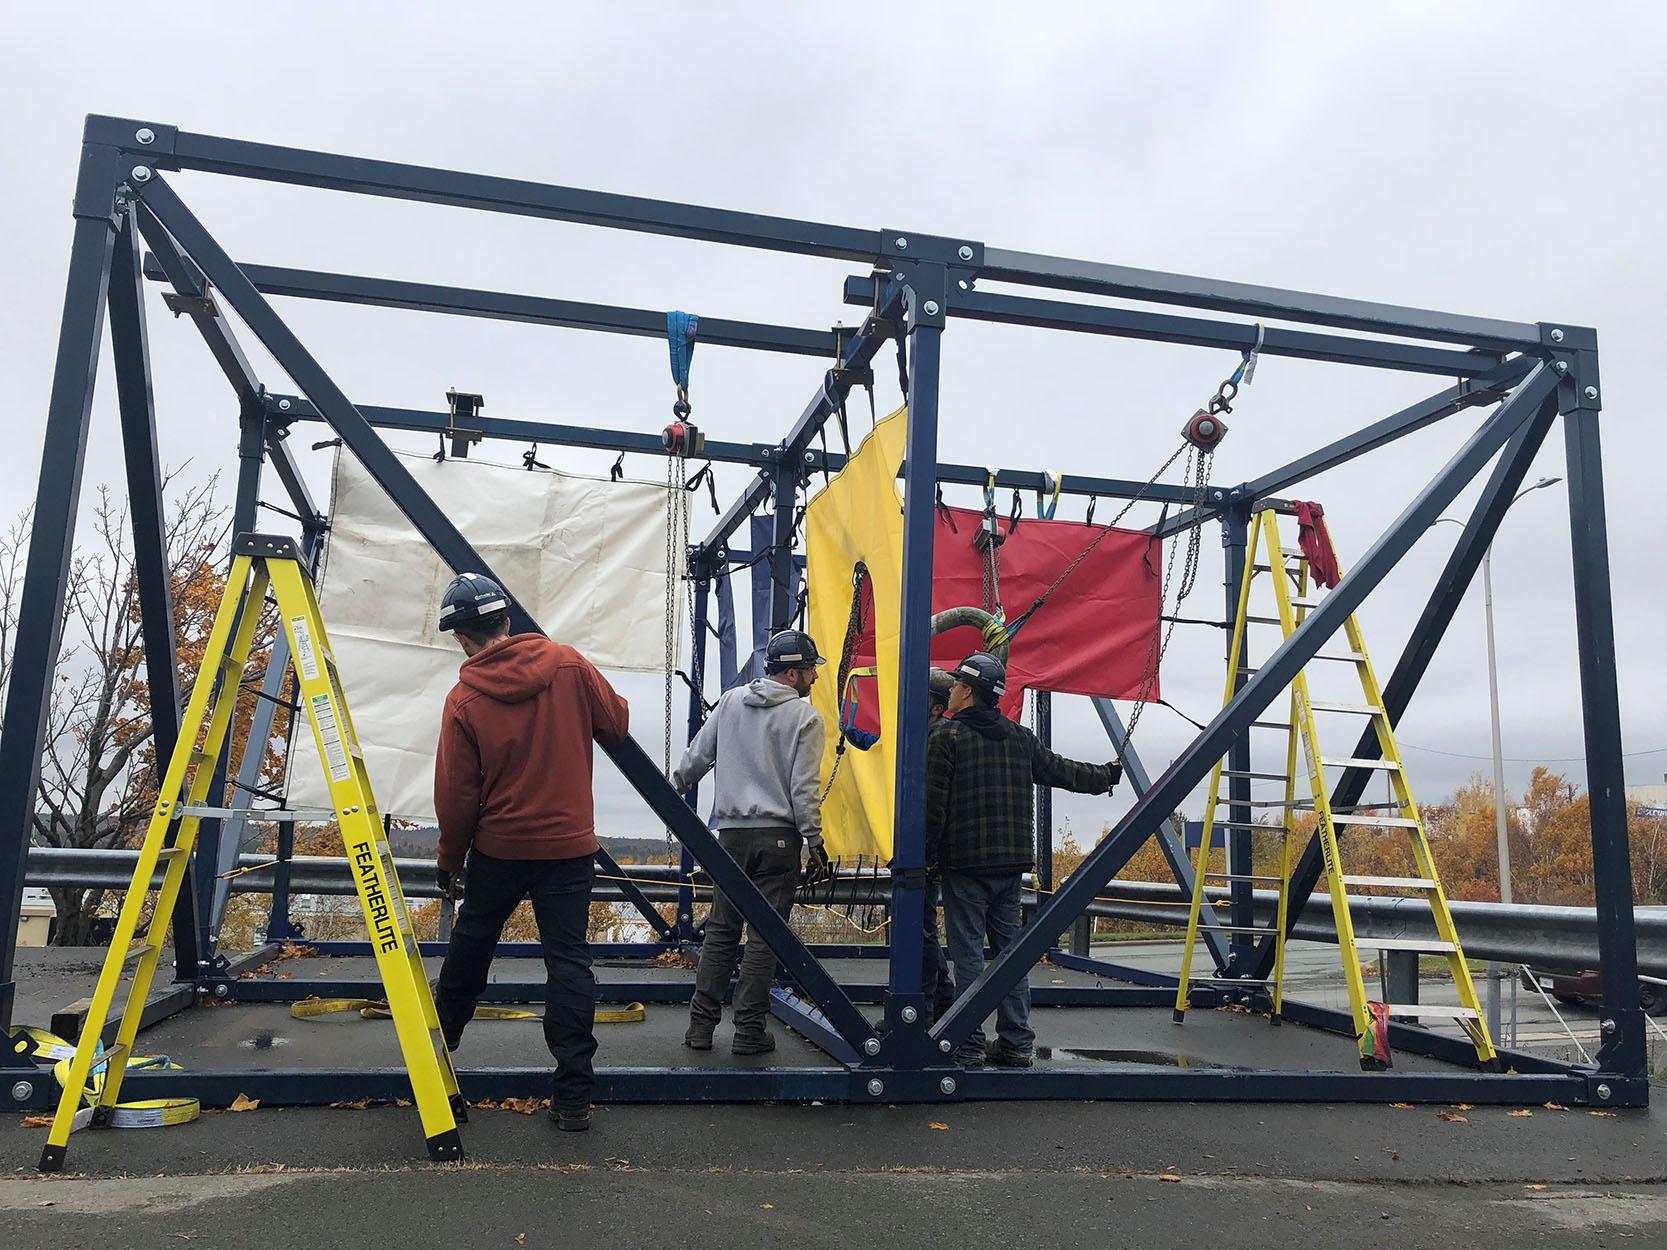 hercules training academy outdoor rigging